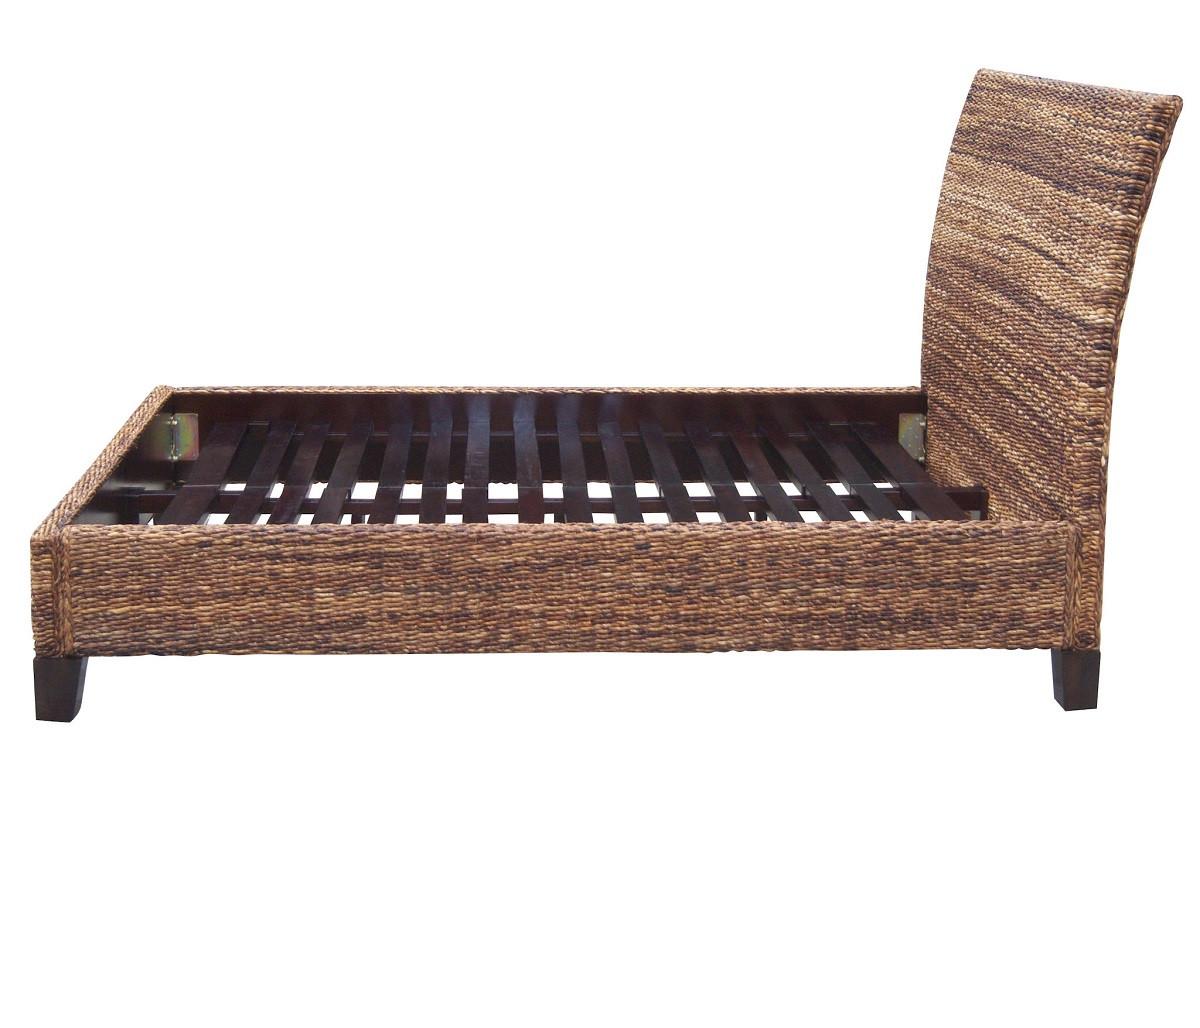 lanai banana leaf woven wicker queen platform bed frame - Queen Platform Bed Frames